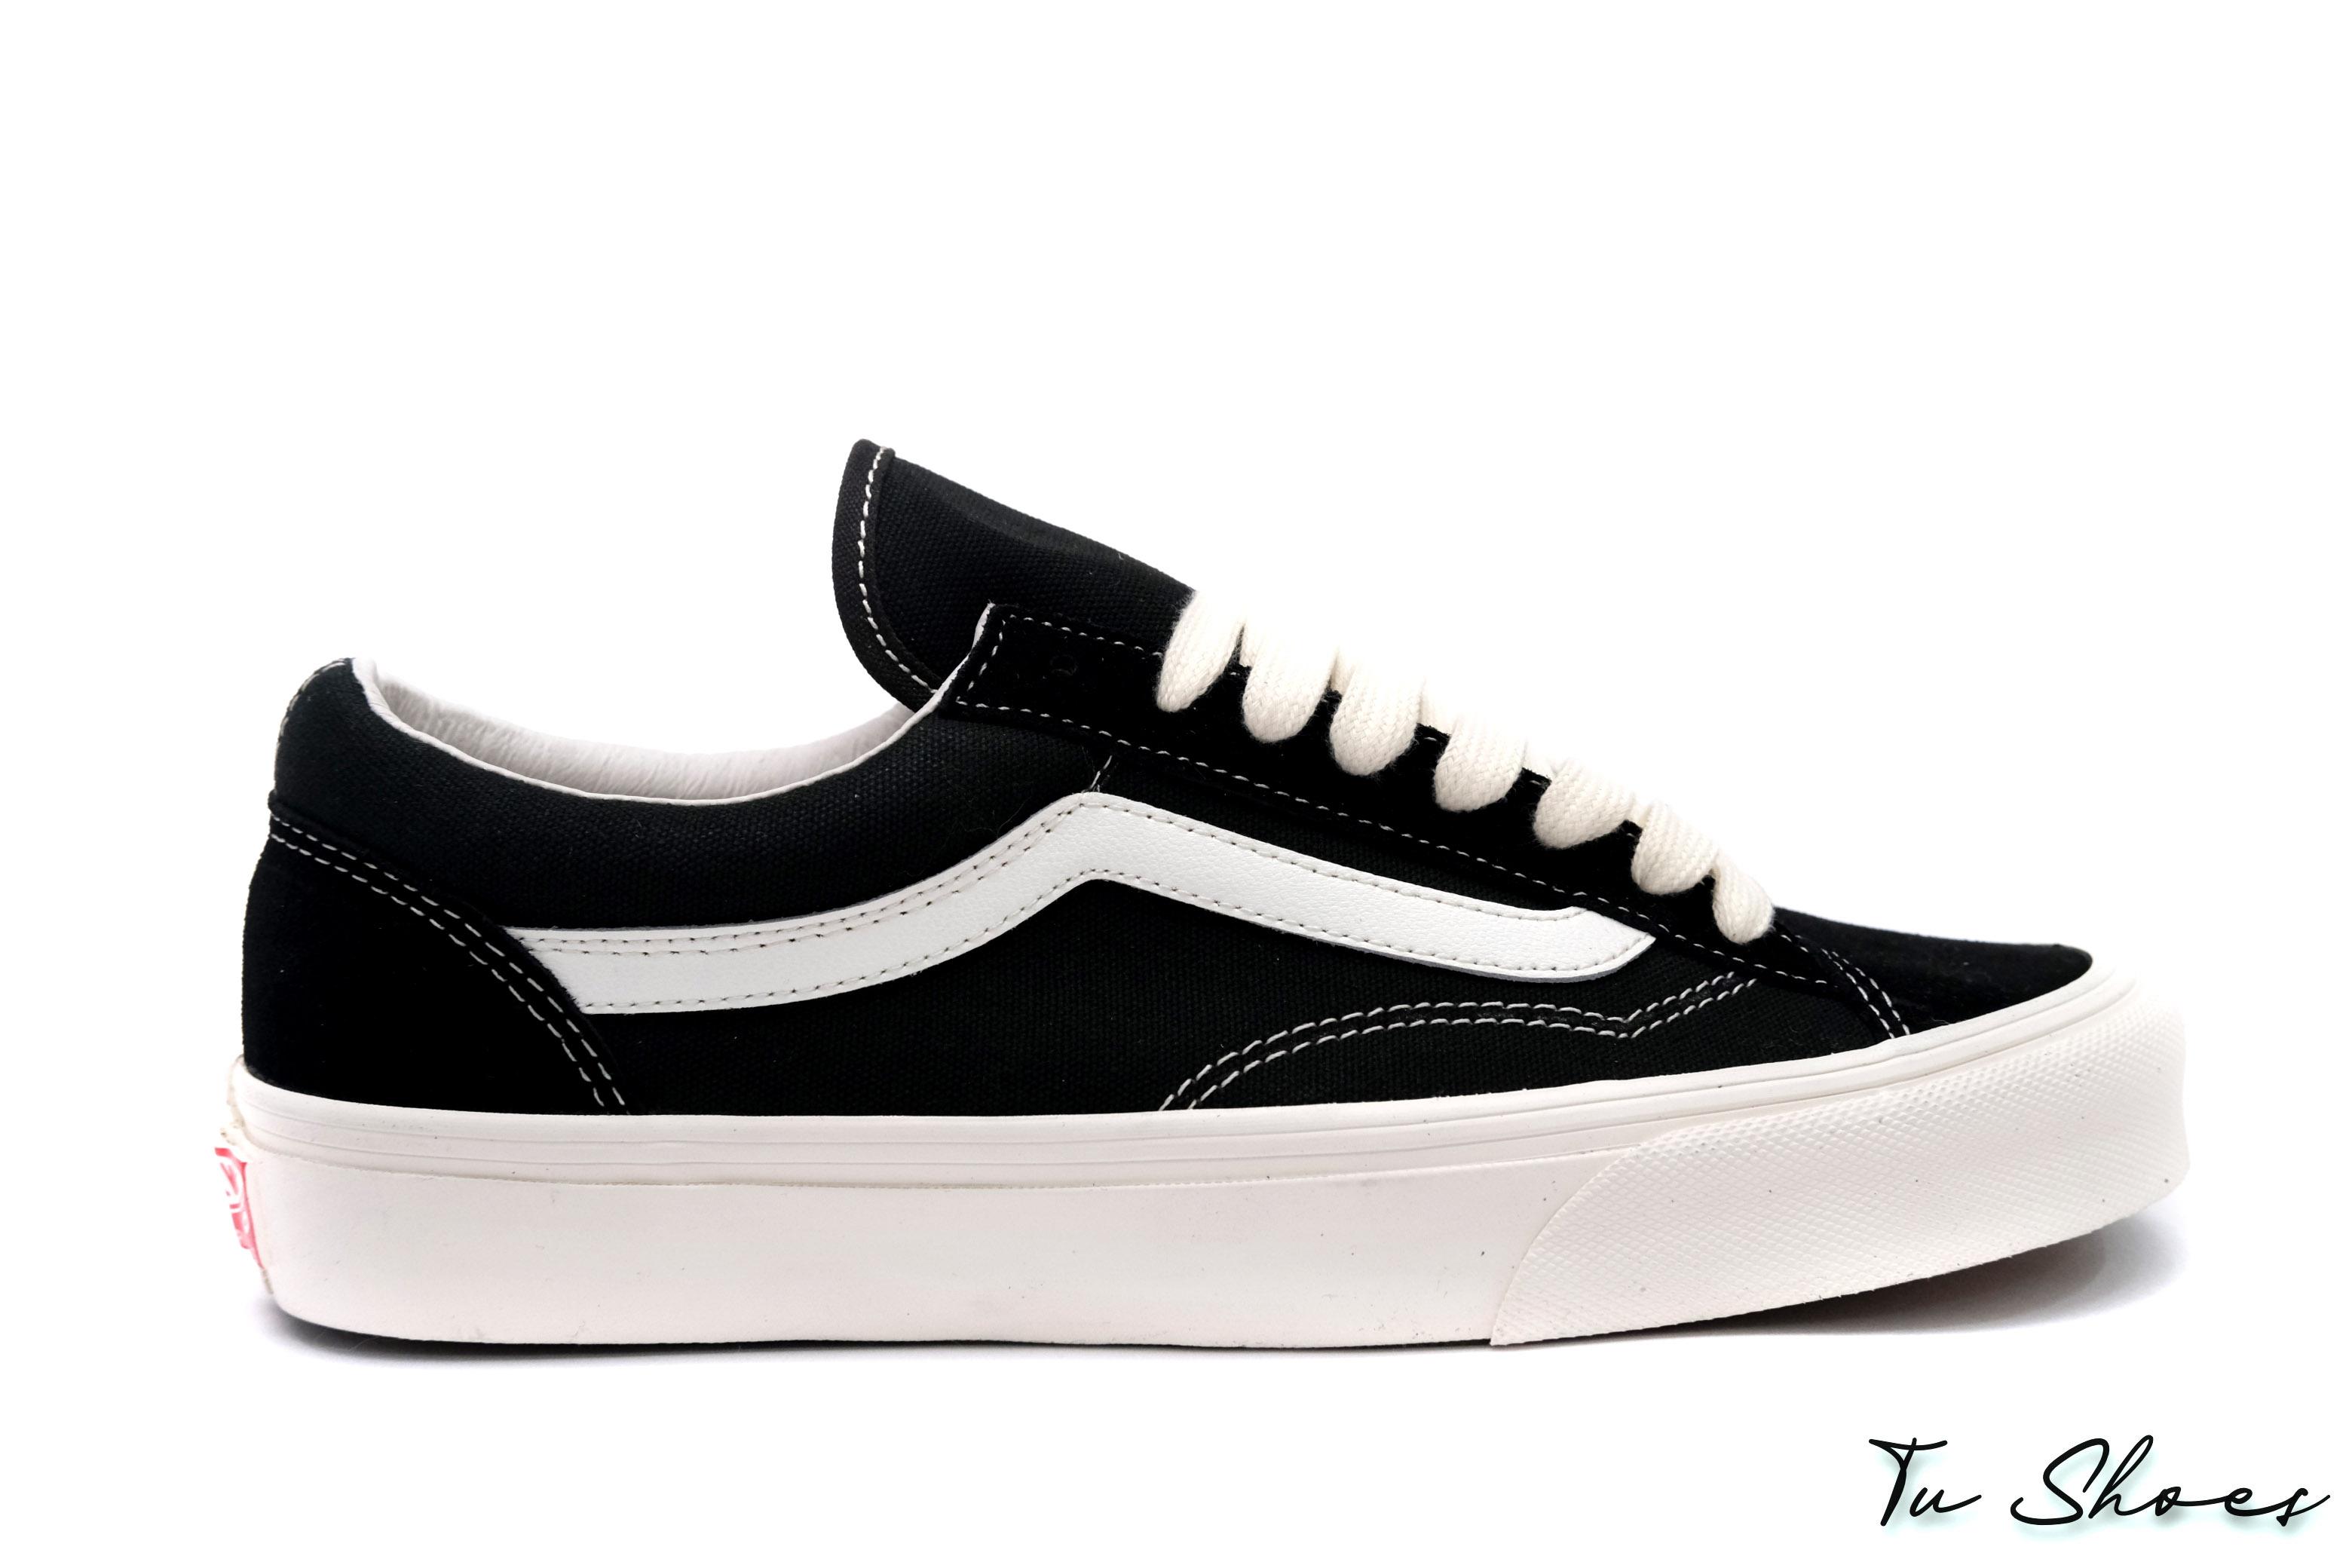 Vans Vault Style 36 Black